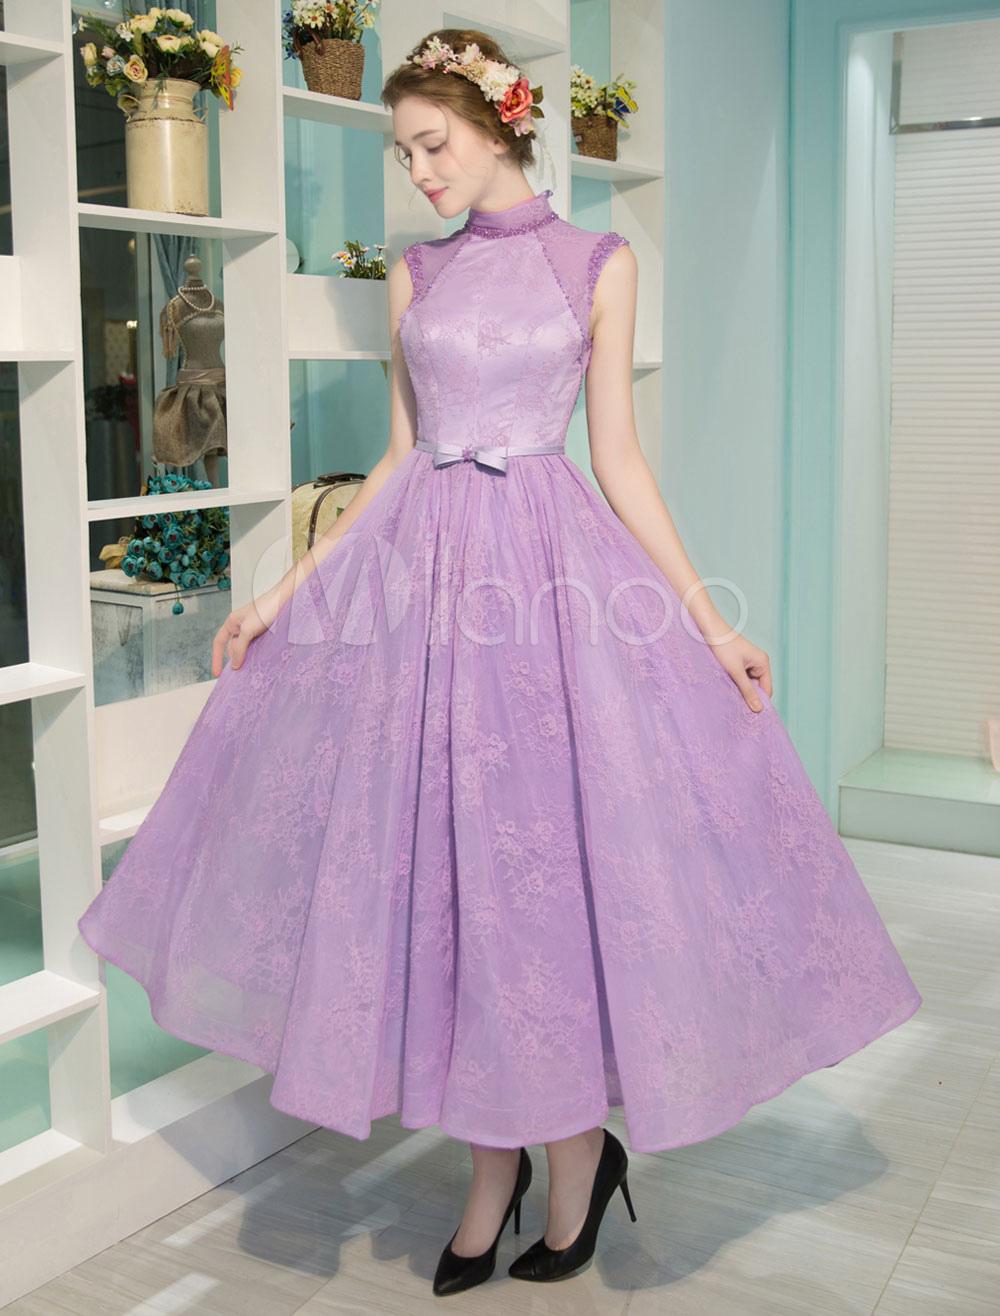 Luxury Cocktail Dresses Vintage Lace Fuchsia Pink High Collar Backless Bow Sash Short Tea Length Homecoming Dress (Wedding) photo